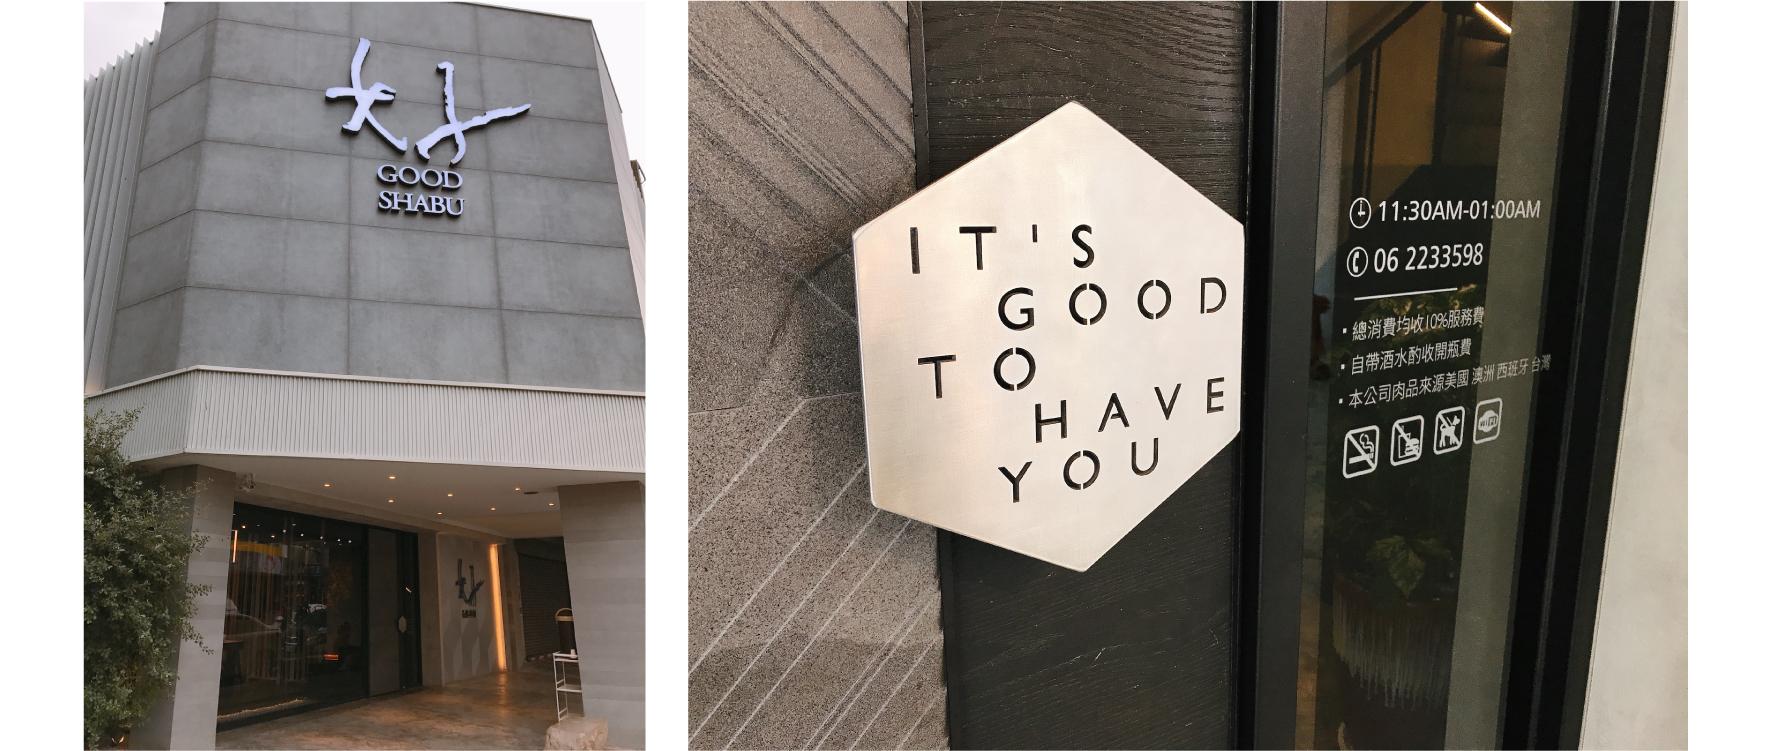 台南 It's Good To Have You 有你真好 火鍋 沙龍